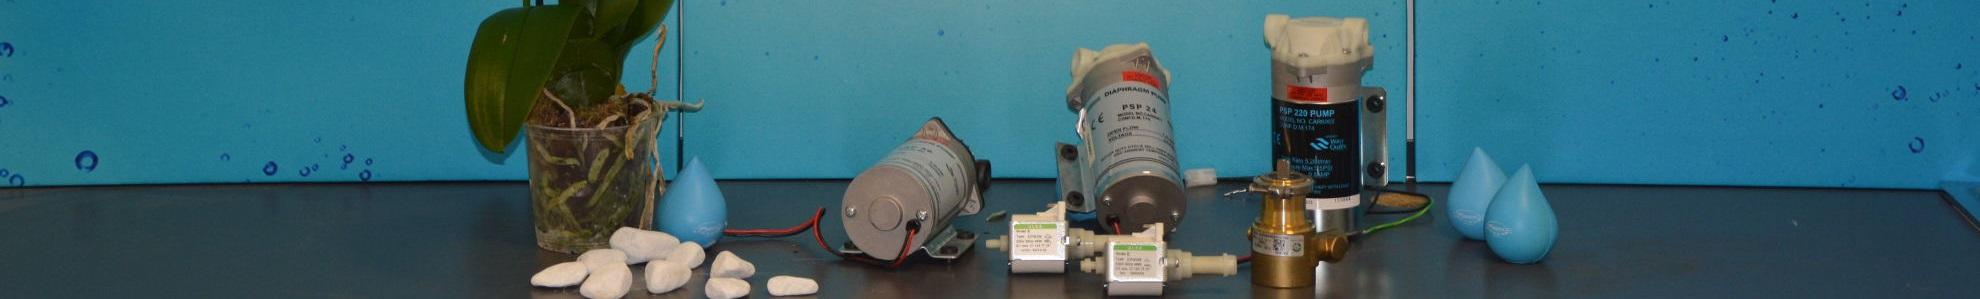 Pompe-motori-impianti-depurazione-panice